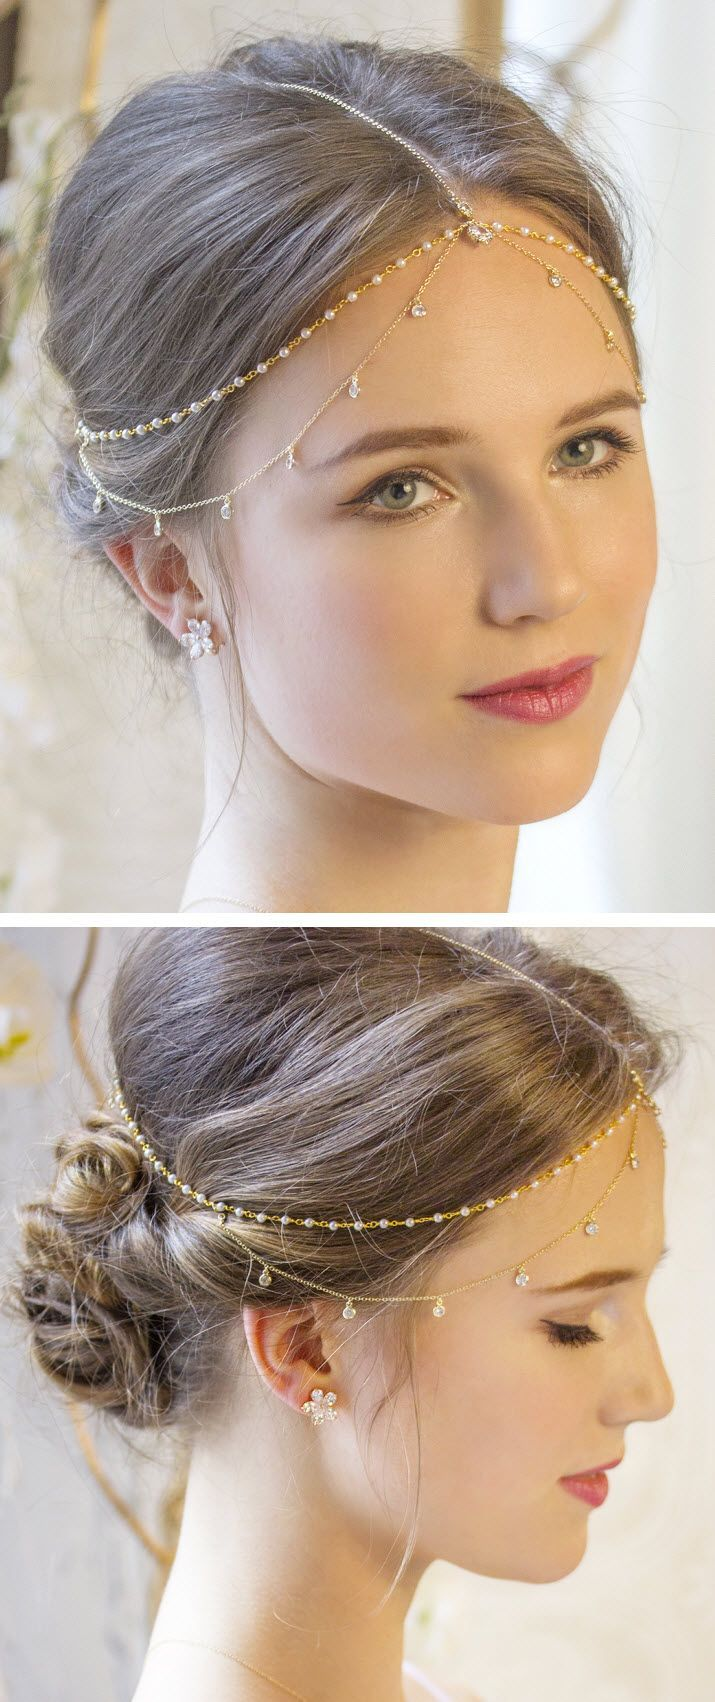 best bridal red carpet prom hair up images on Pinterest Hair